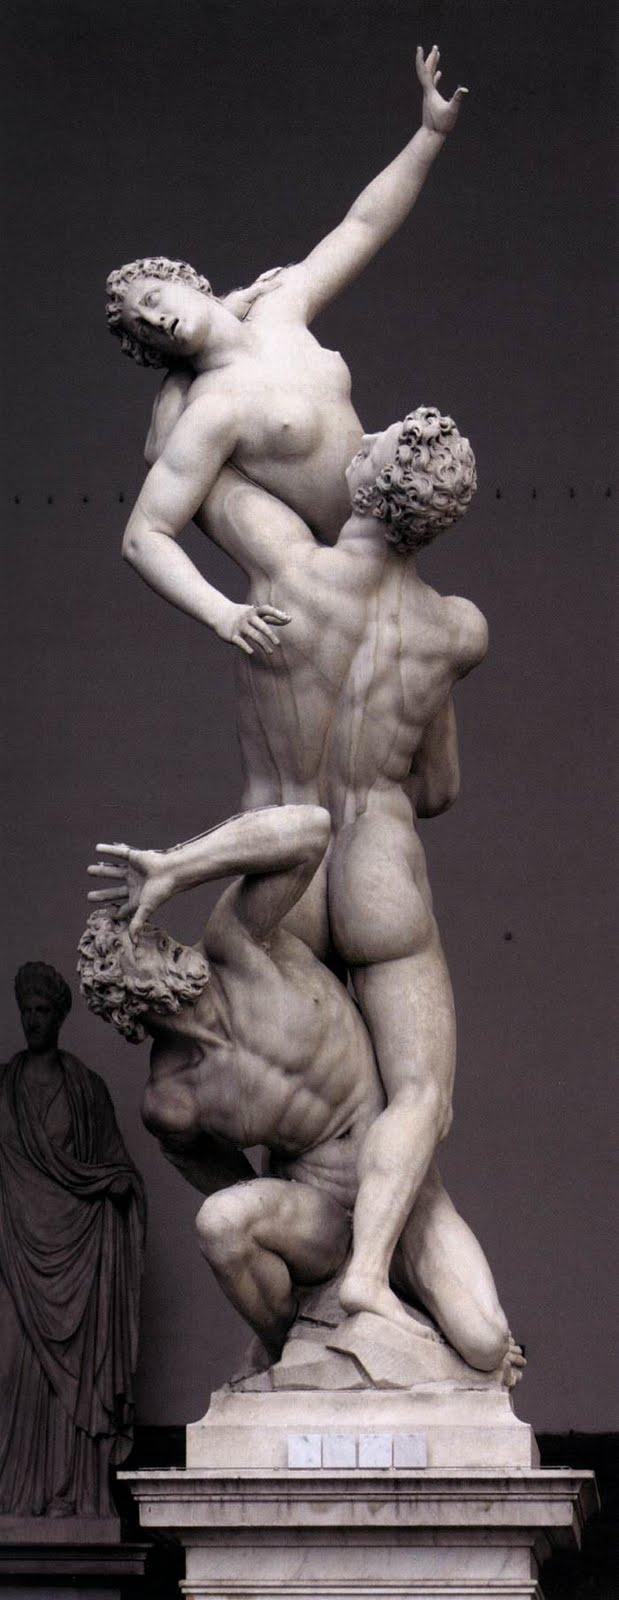 [Giambologna,+Rape+of+a+Sabine,+1581-83]